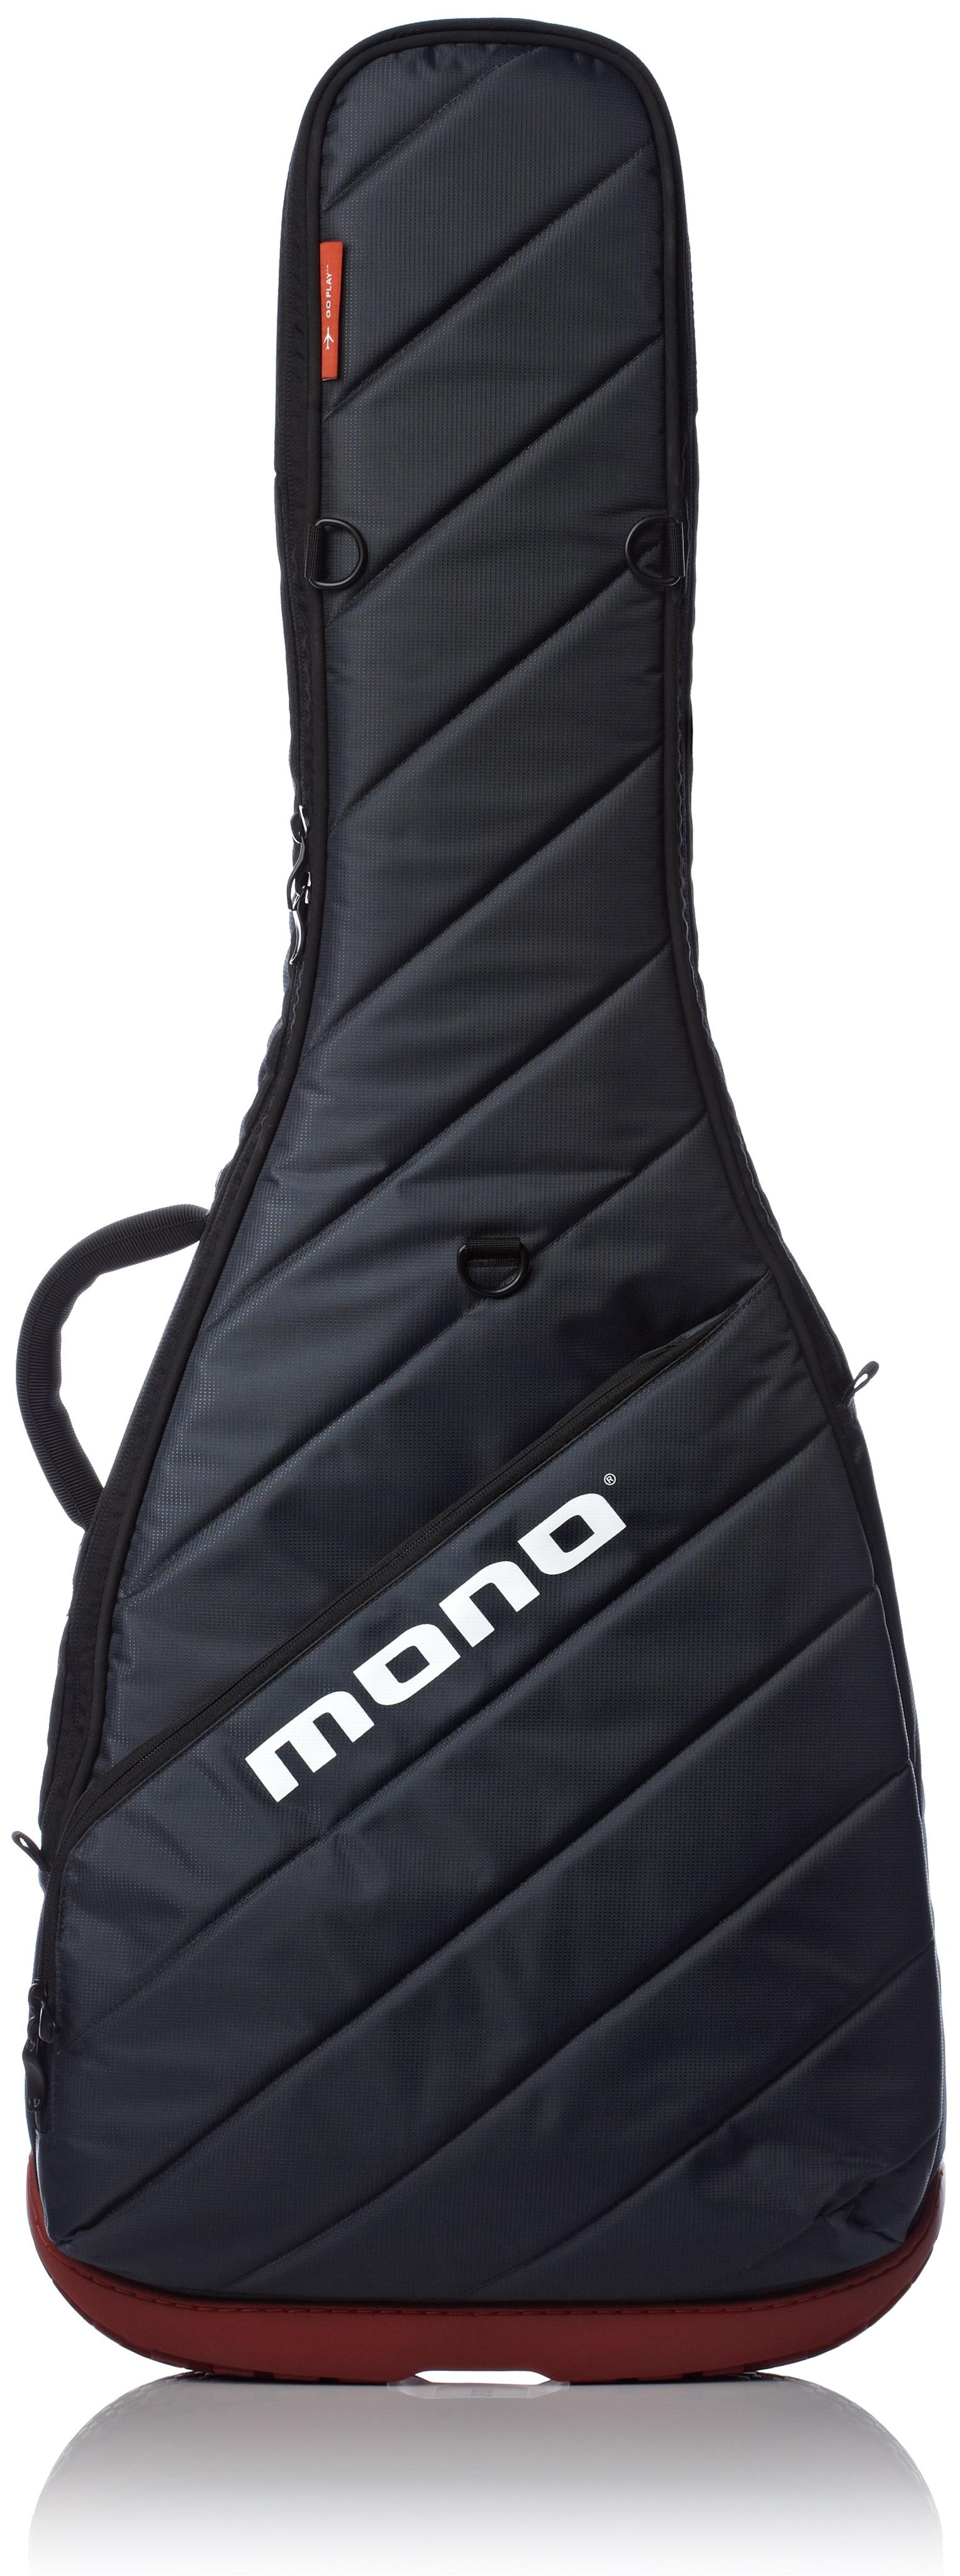 Mono M80-VEG-GRY